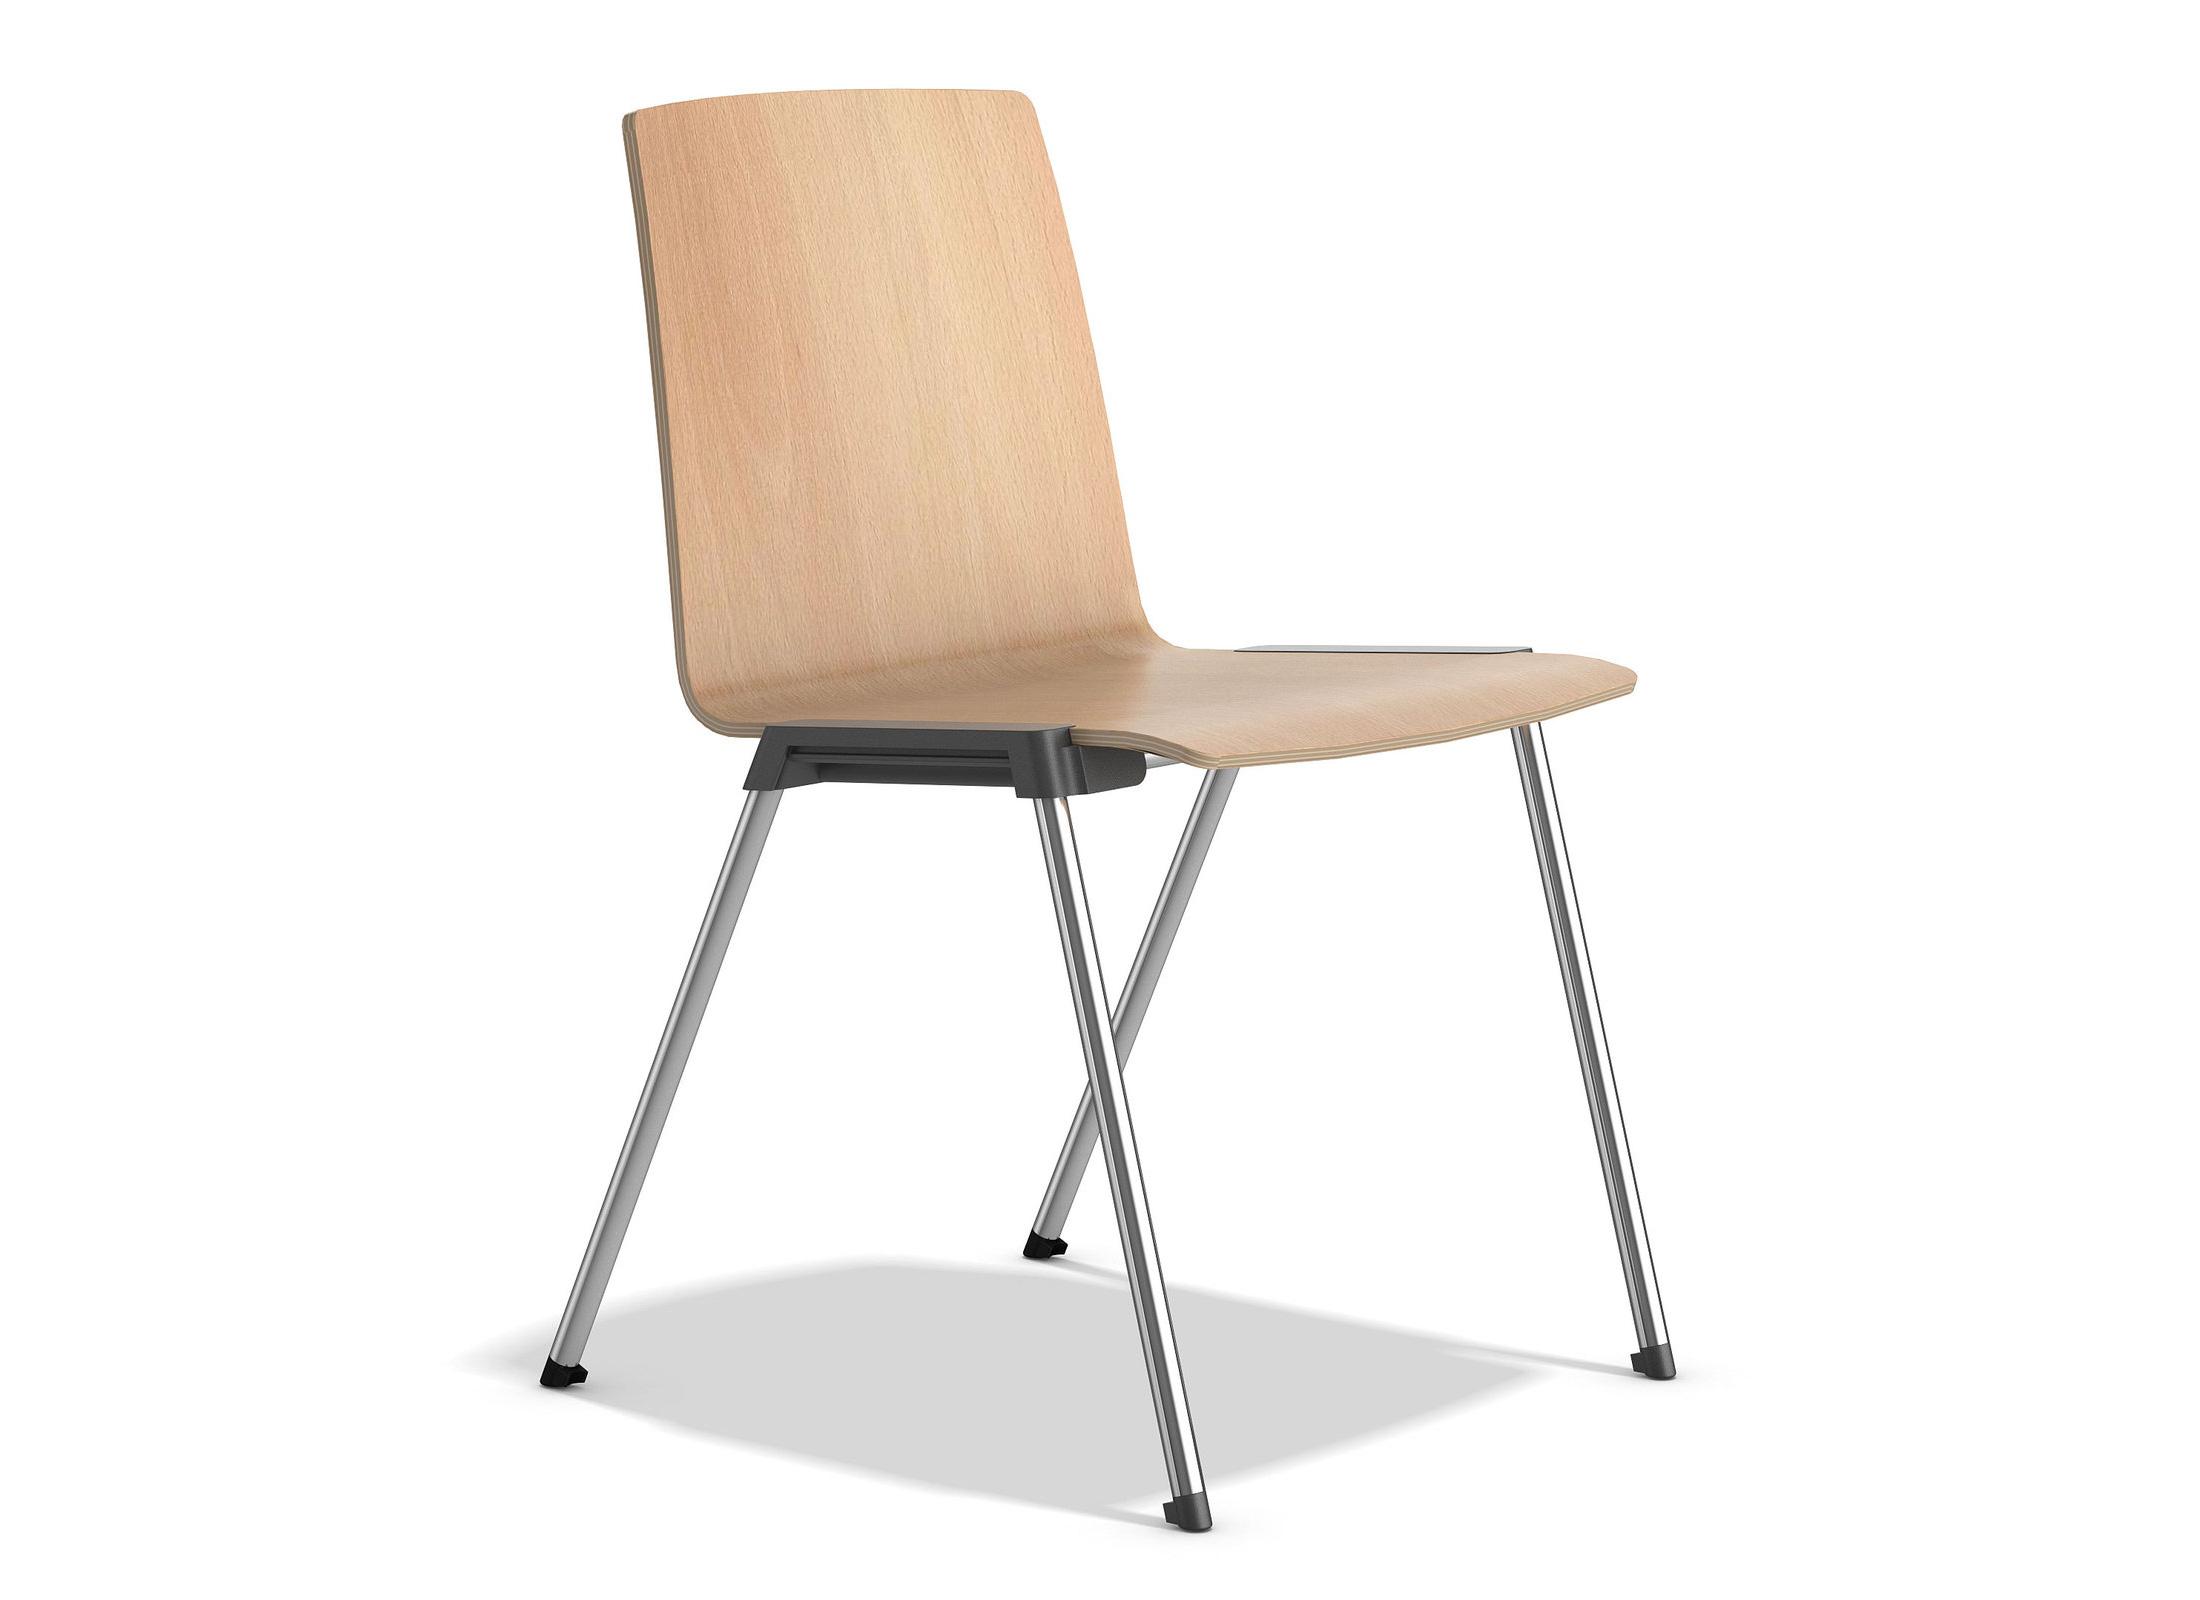 objektst hle zurbuchen ag amlikon objekt raum design. Black Bedroom Furniture Sets. Home Design Ideas